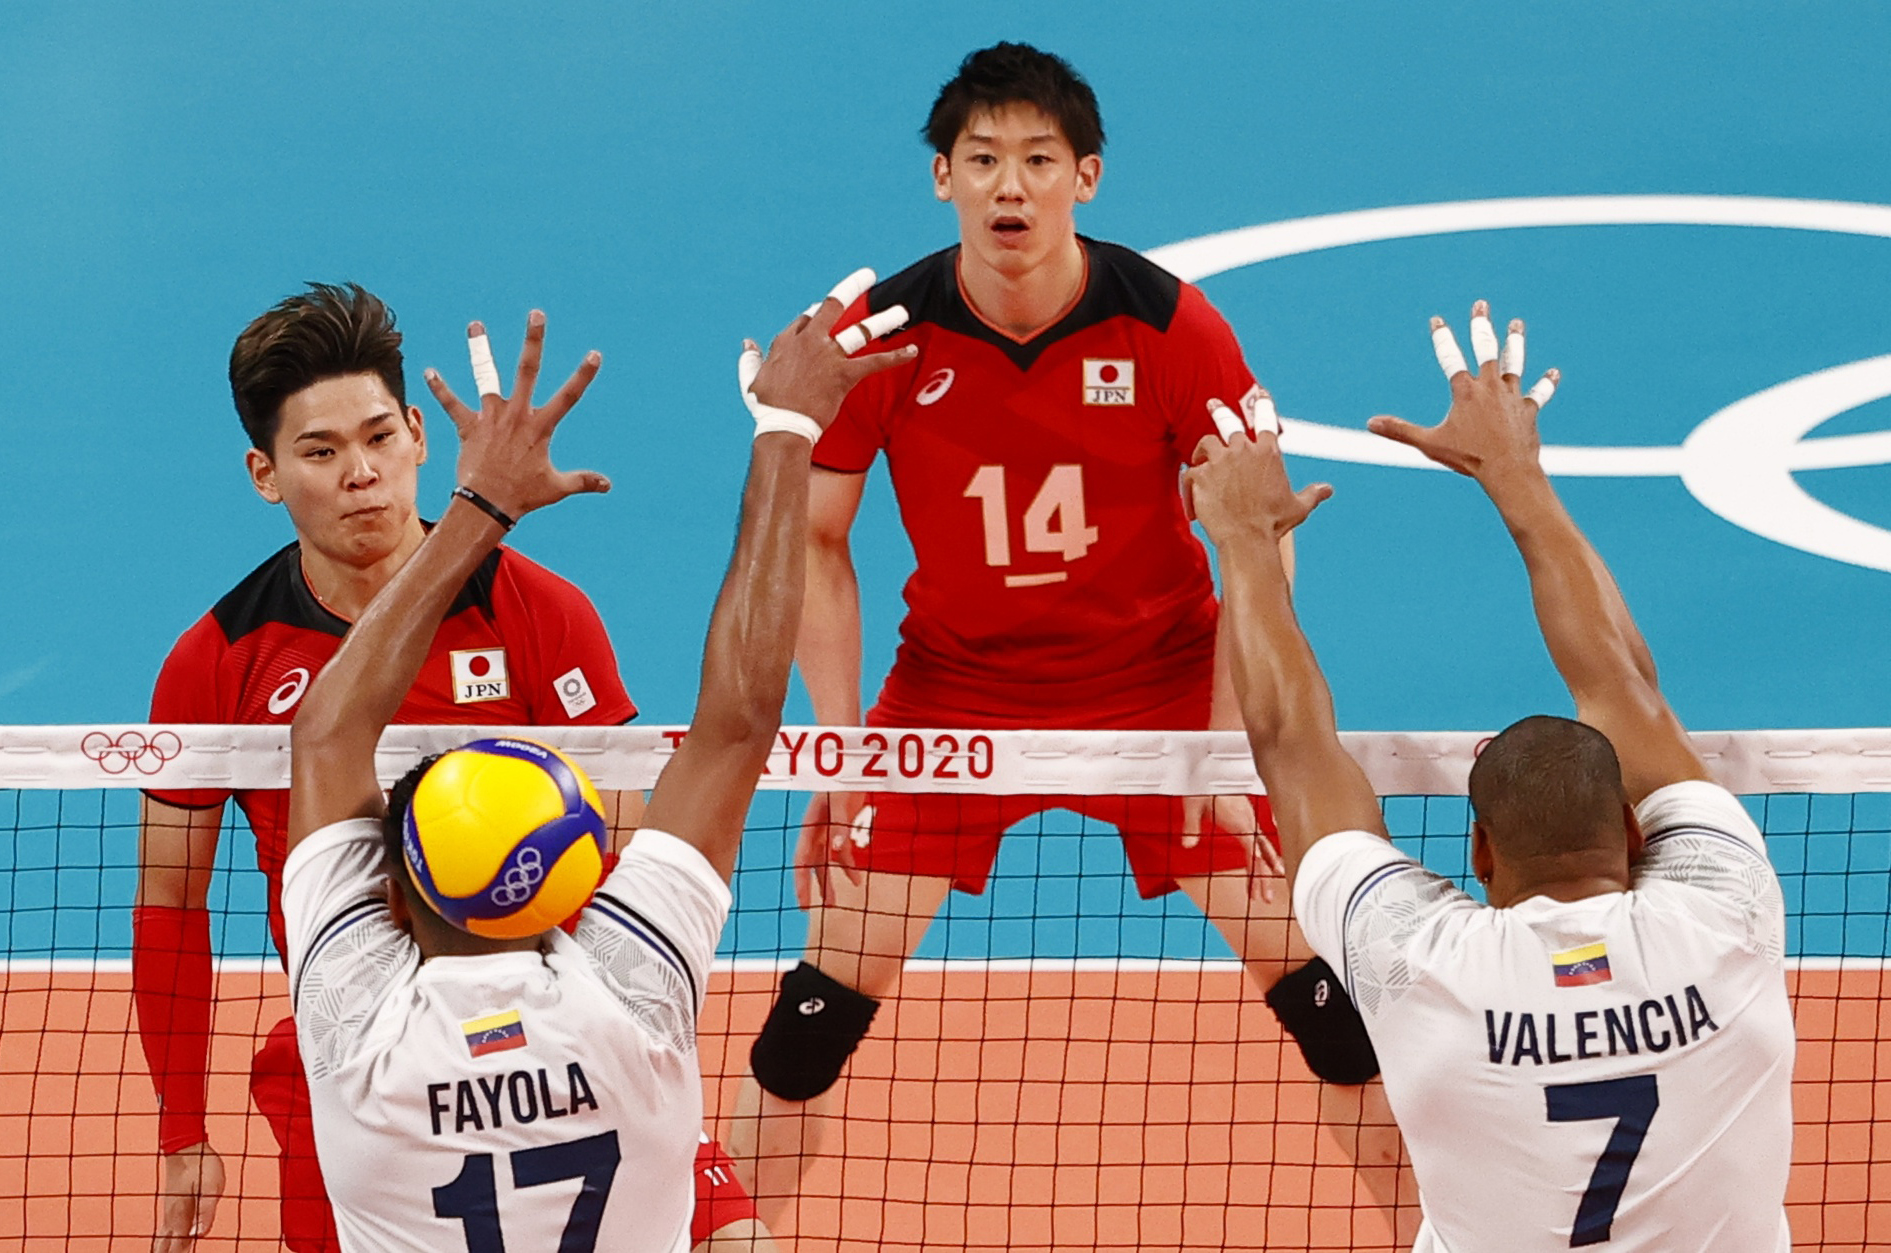 Tokyo 2020 Olympics -Volleyball - Men's Pool A - Japan v Venezuela - Ariake Arena, Tokyo, Japan – July 24, 2021. Yuki Ishikawa of Japan in action with Edson Valencia of Venezuela. REUTERS/Carlos Garcia Rawlins